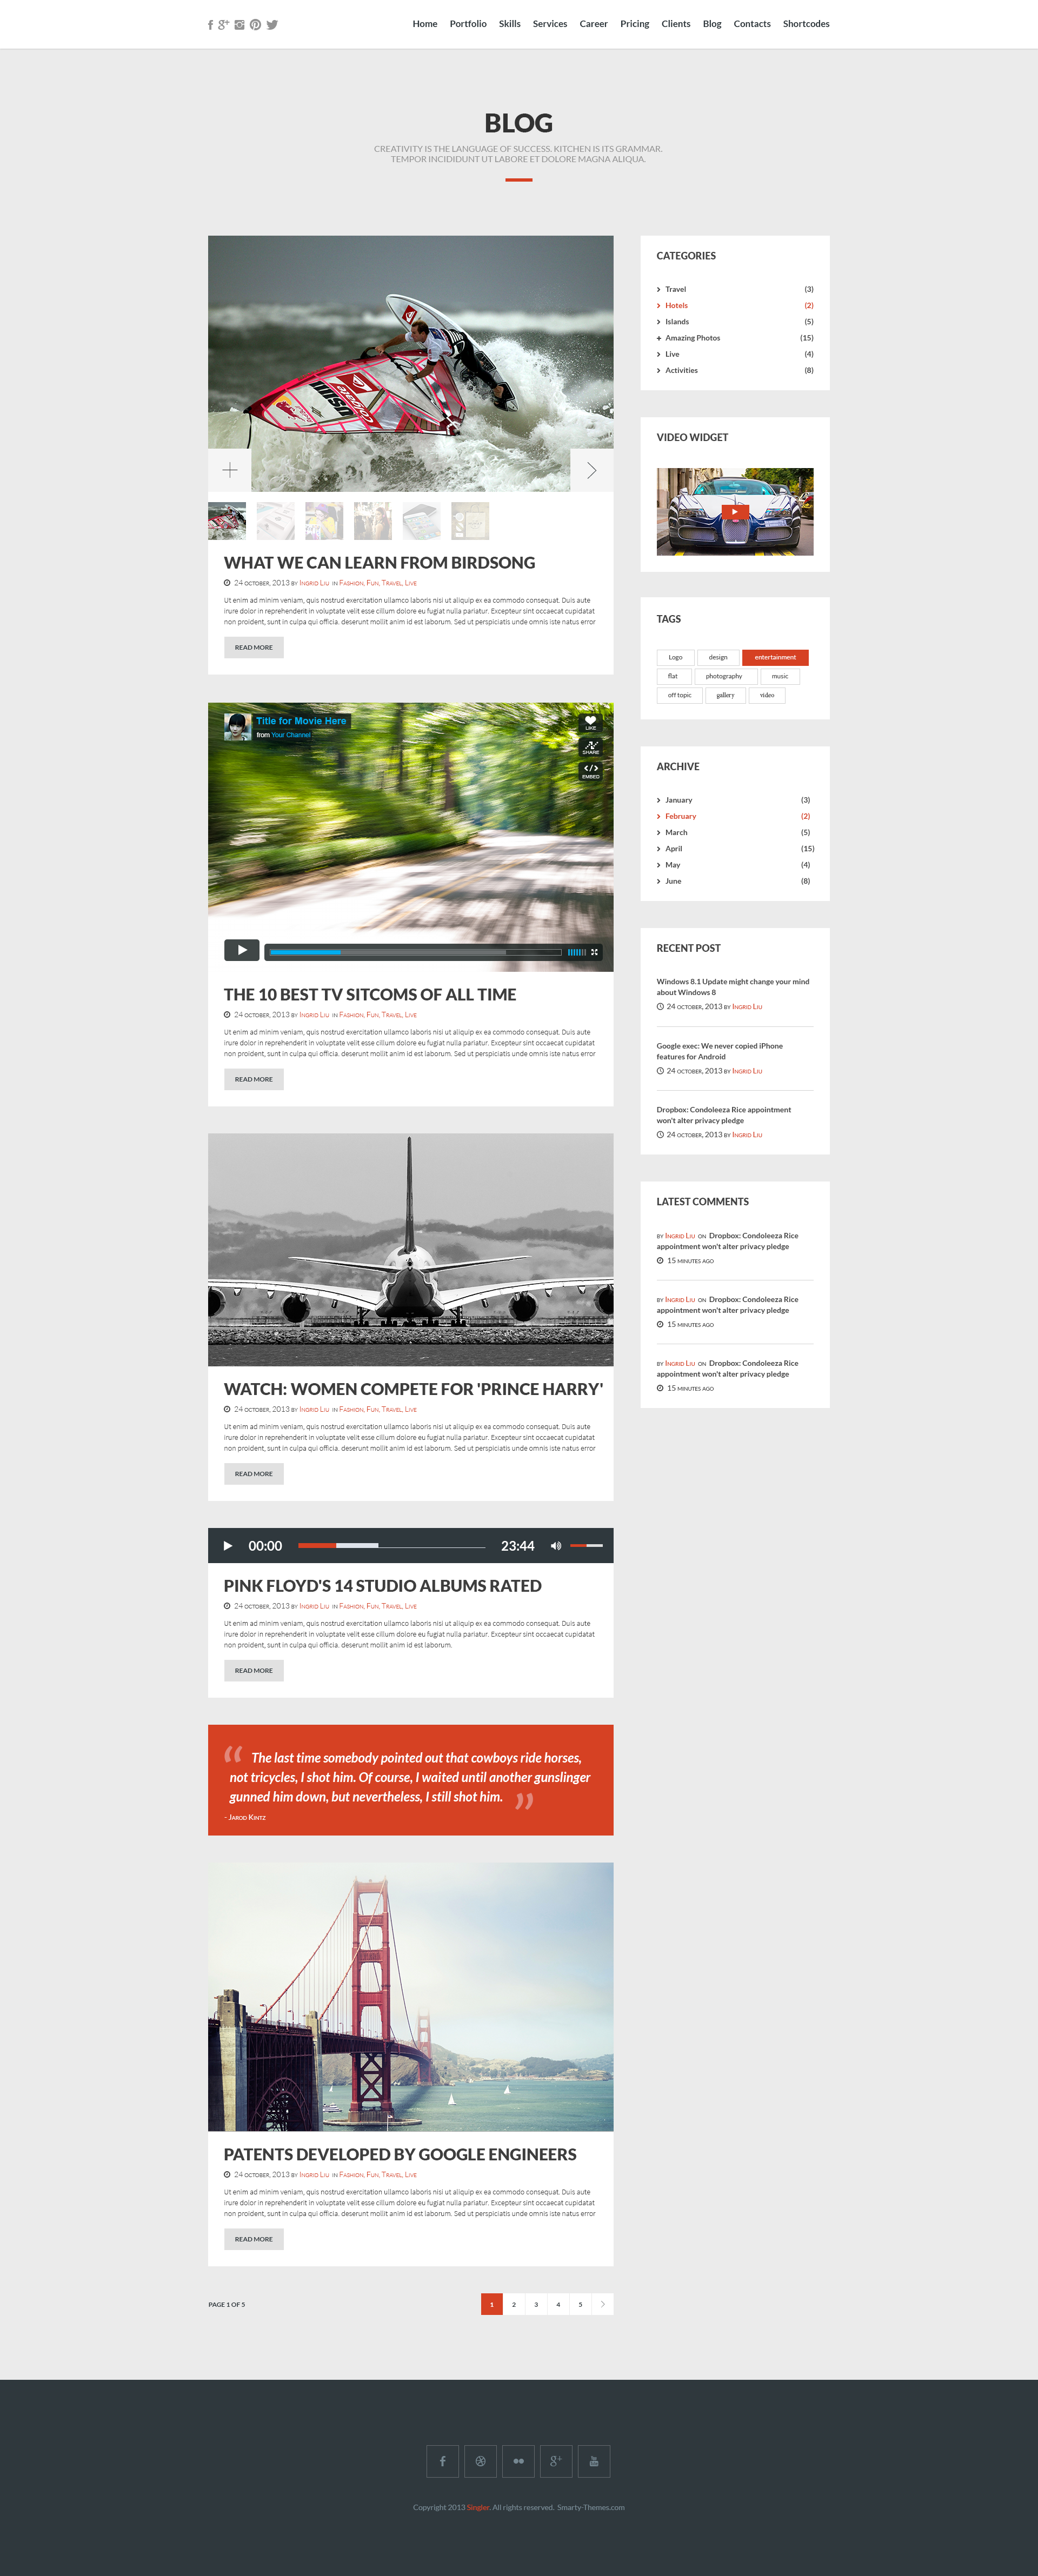 Google themes pink floyd - Bizzex Modern Flat Portfolio Theme